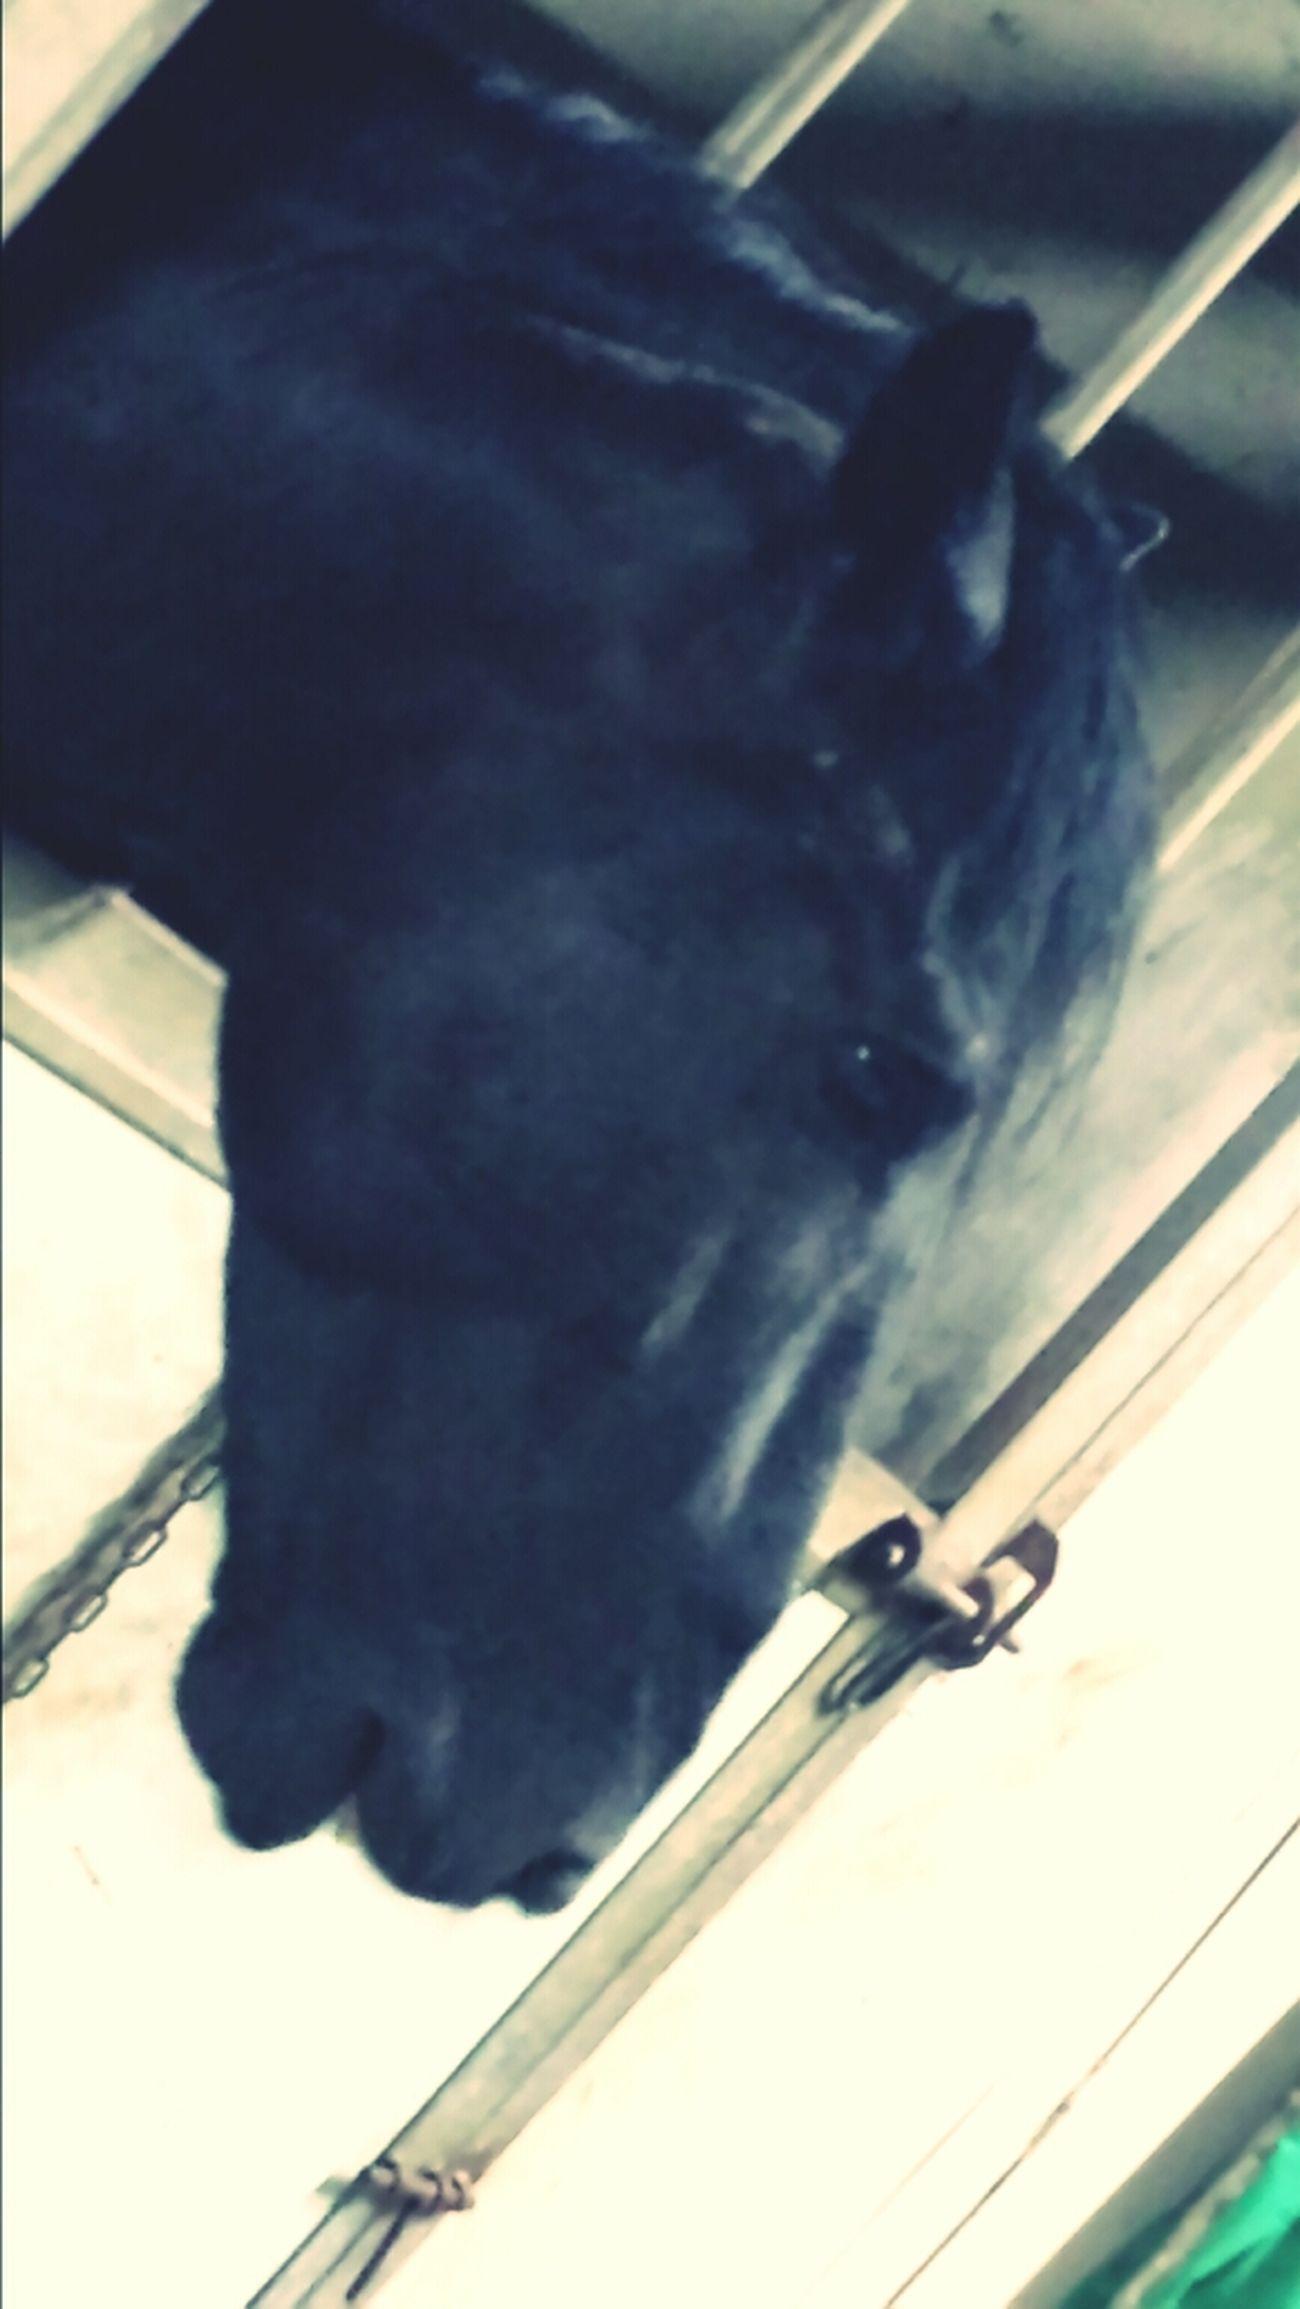 She seems a lil sad. Animal Horse Agriturismo Agritourism